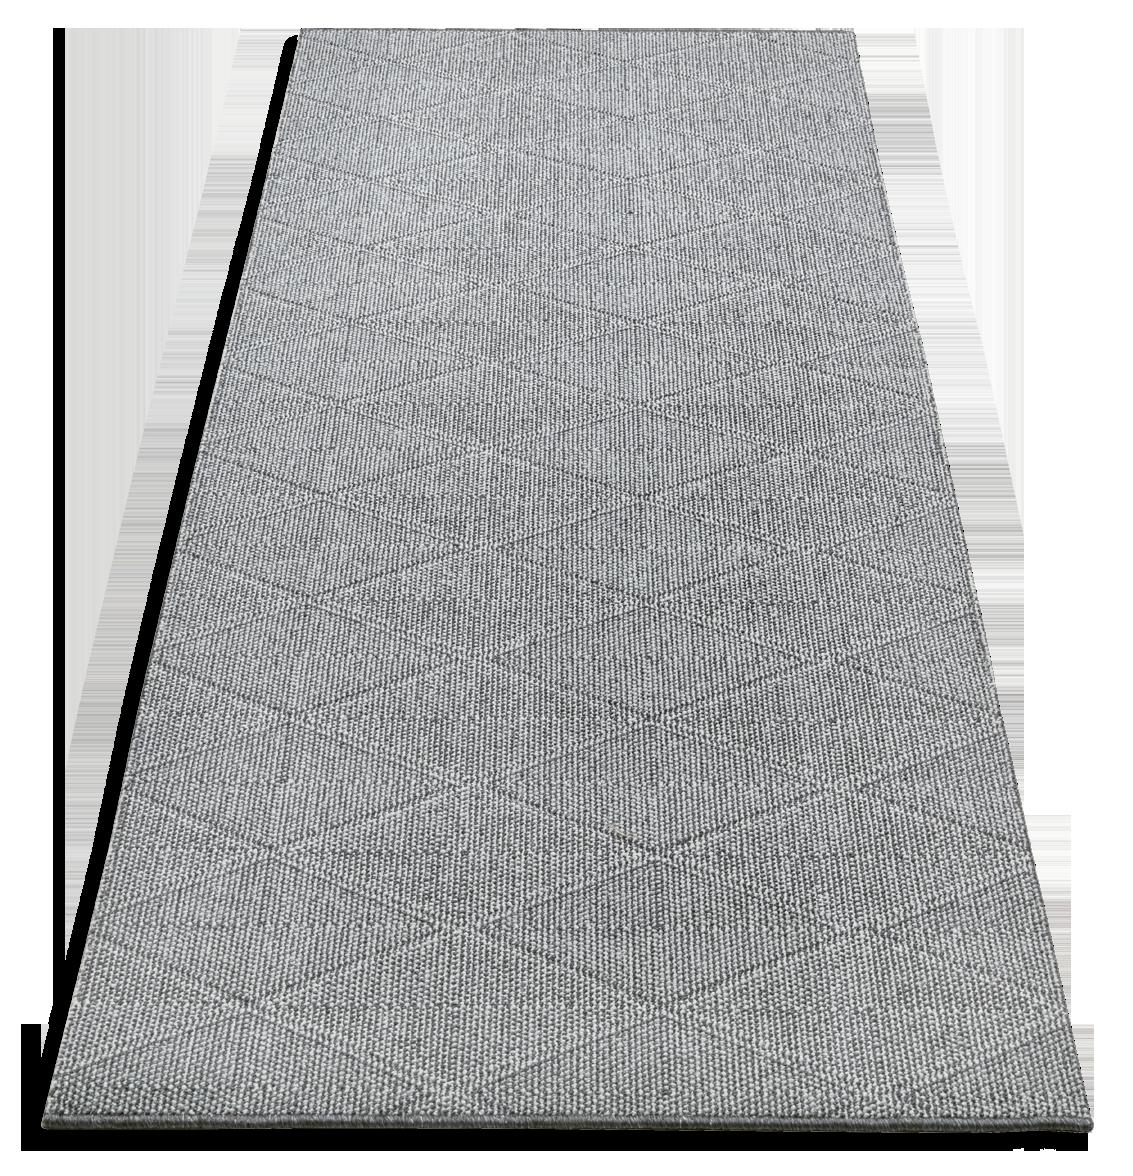 polar matto 80 x 300 cm tummanharmaa k yt v matot asko. Black Bedroom Furniture Sets. Home Design Ideas